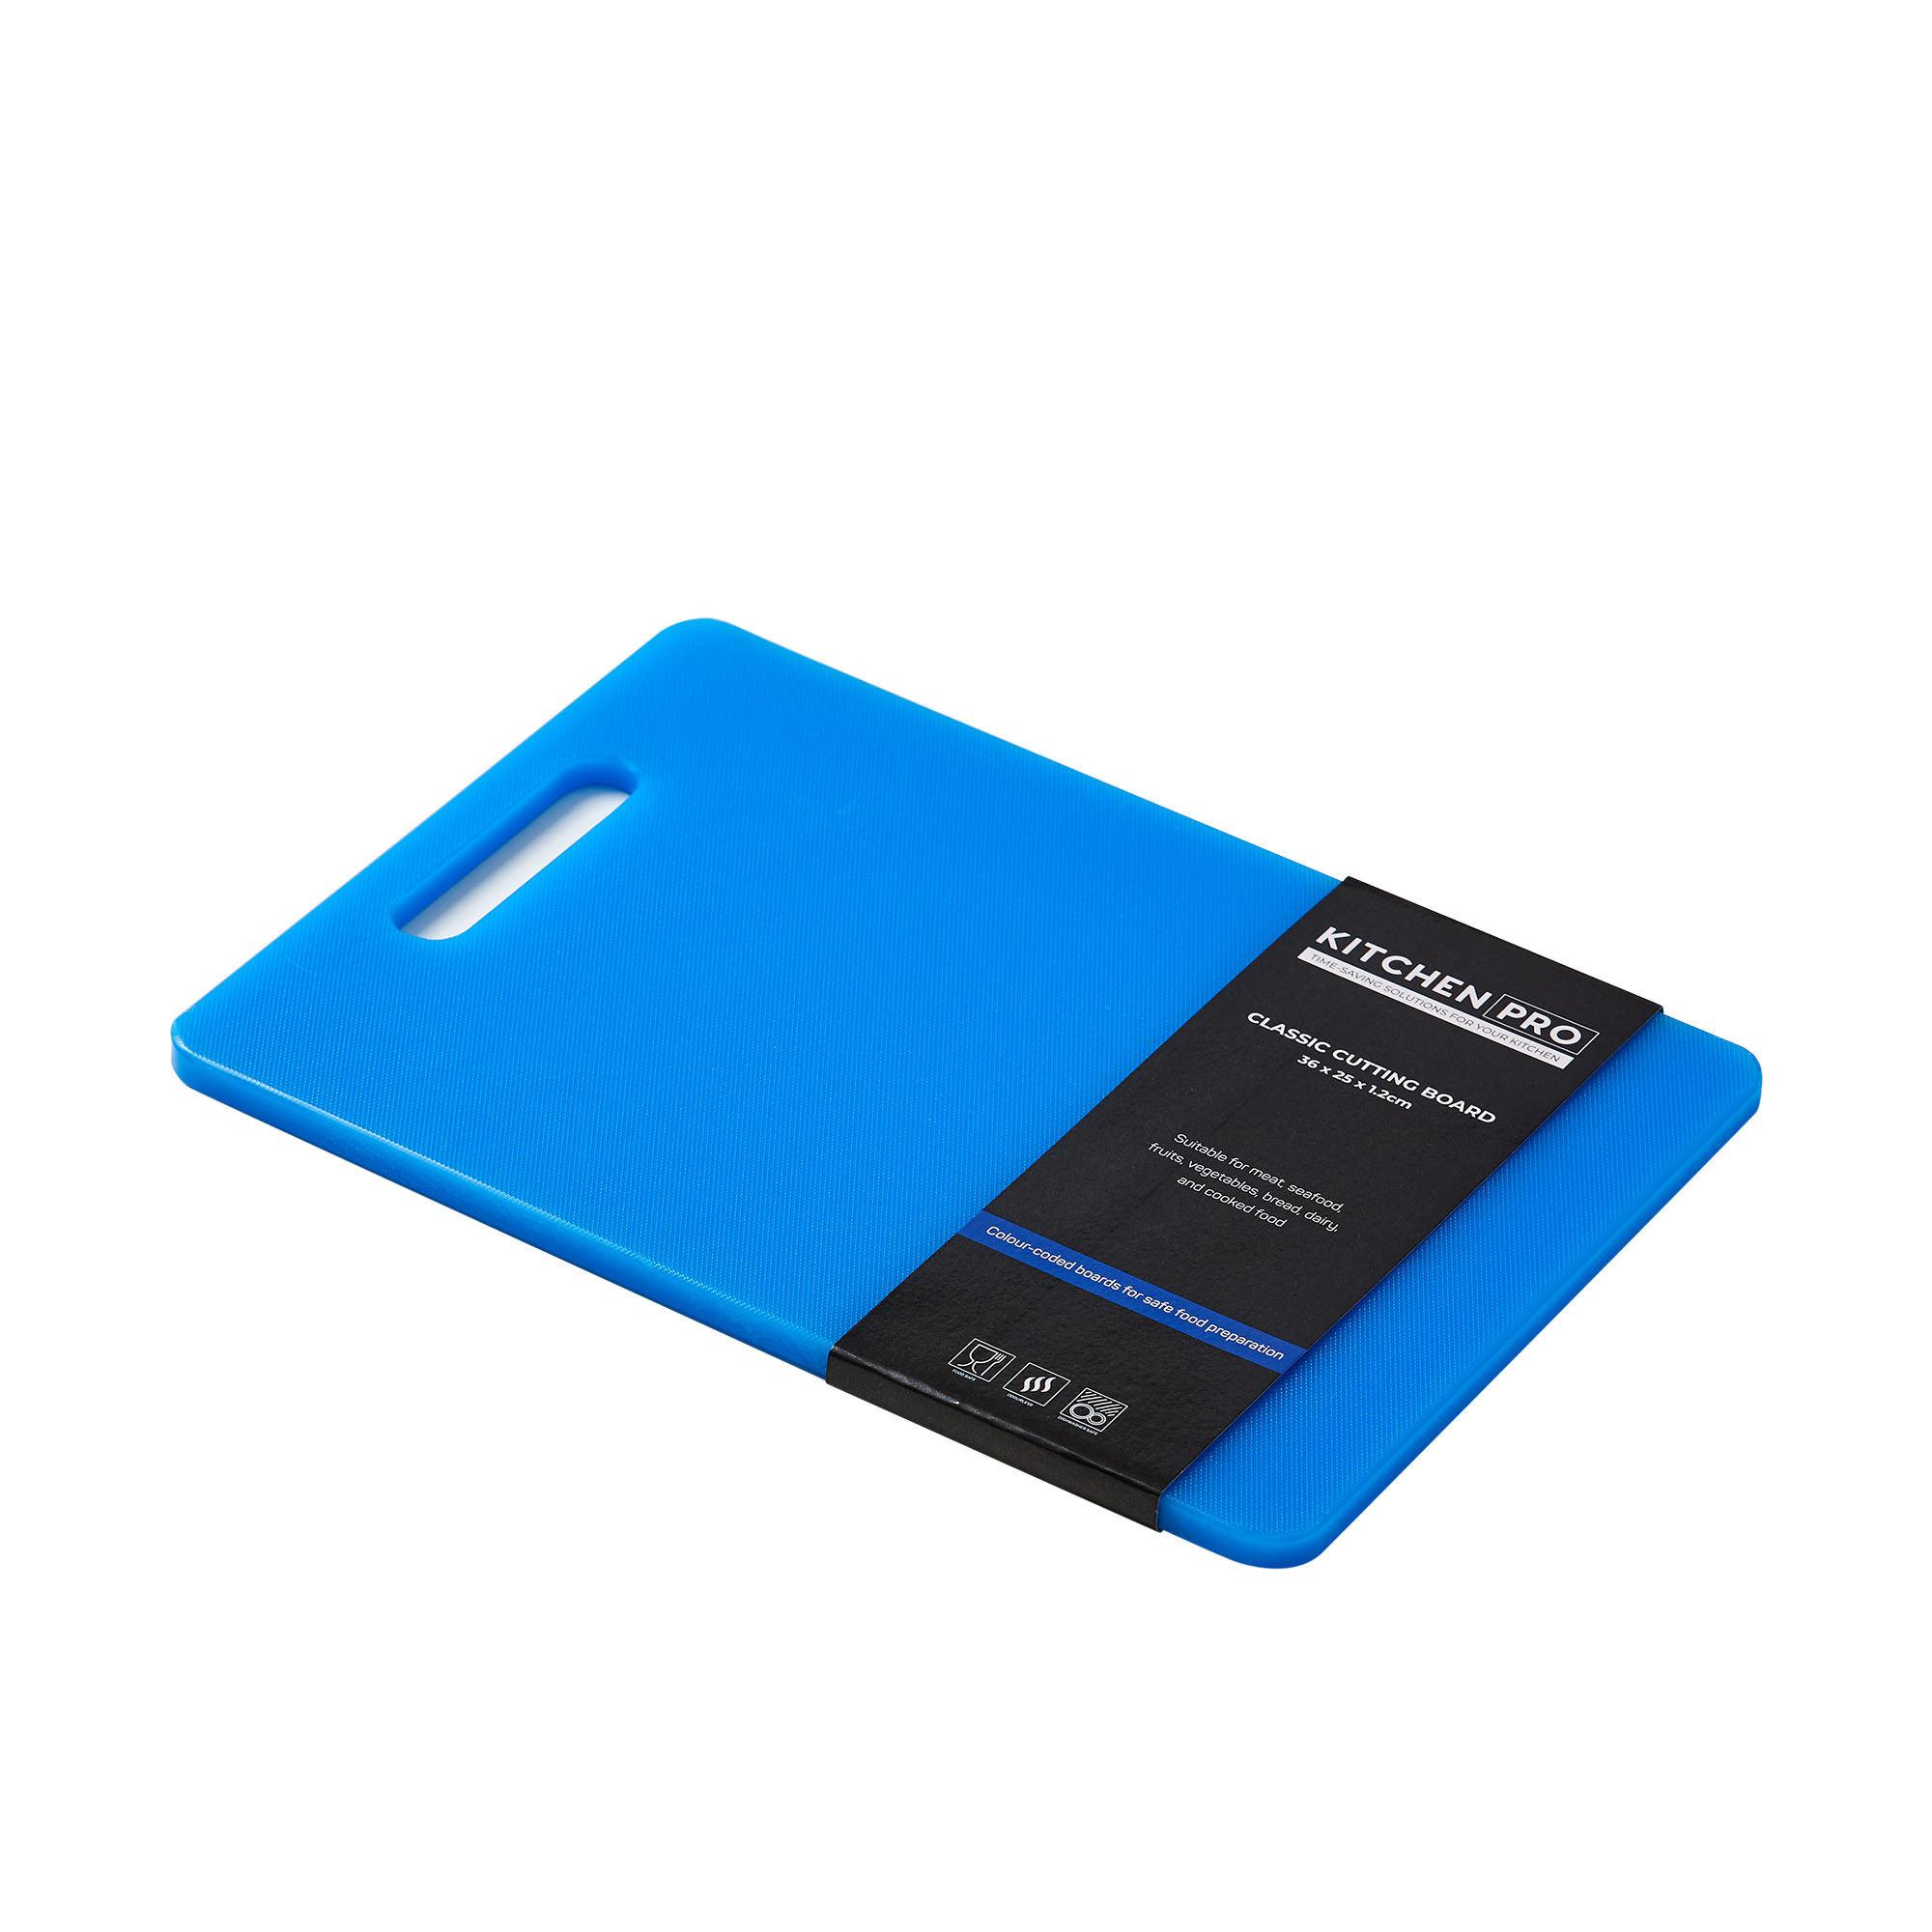 Kitchen Pro Classic Cutting Board 36x25x1.2cm Blue image #2